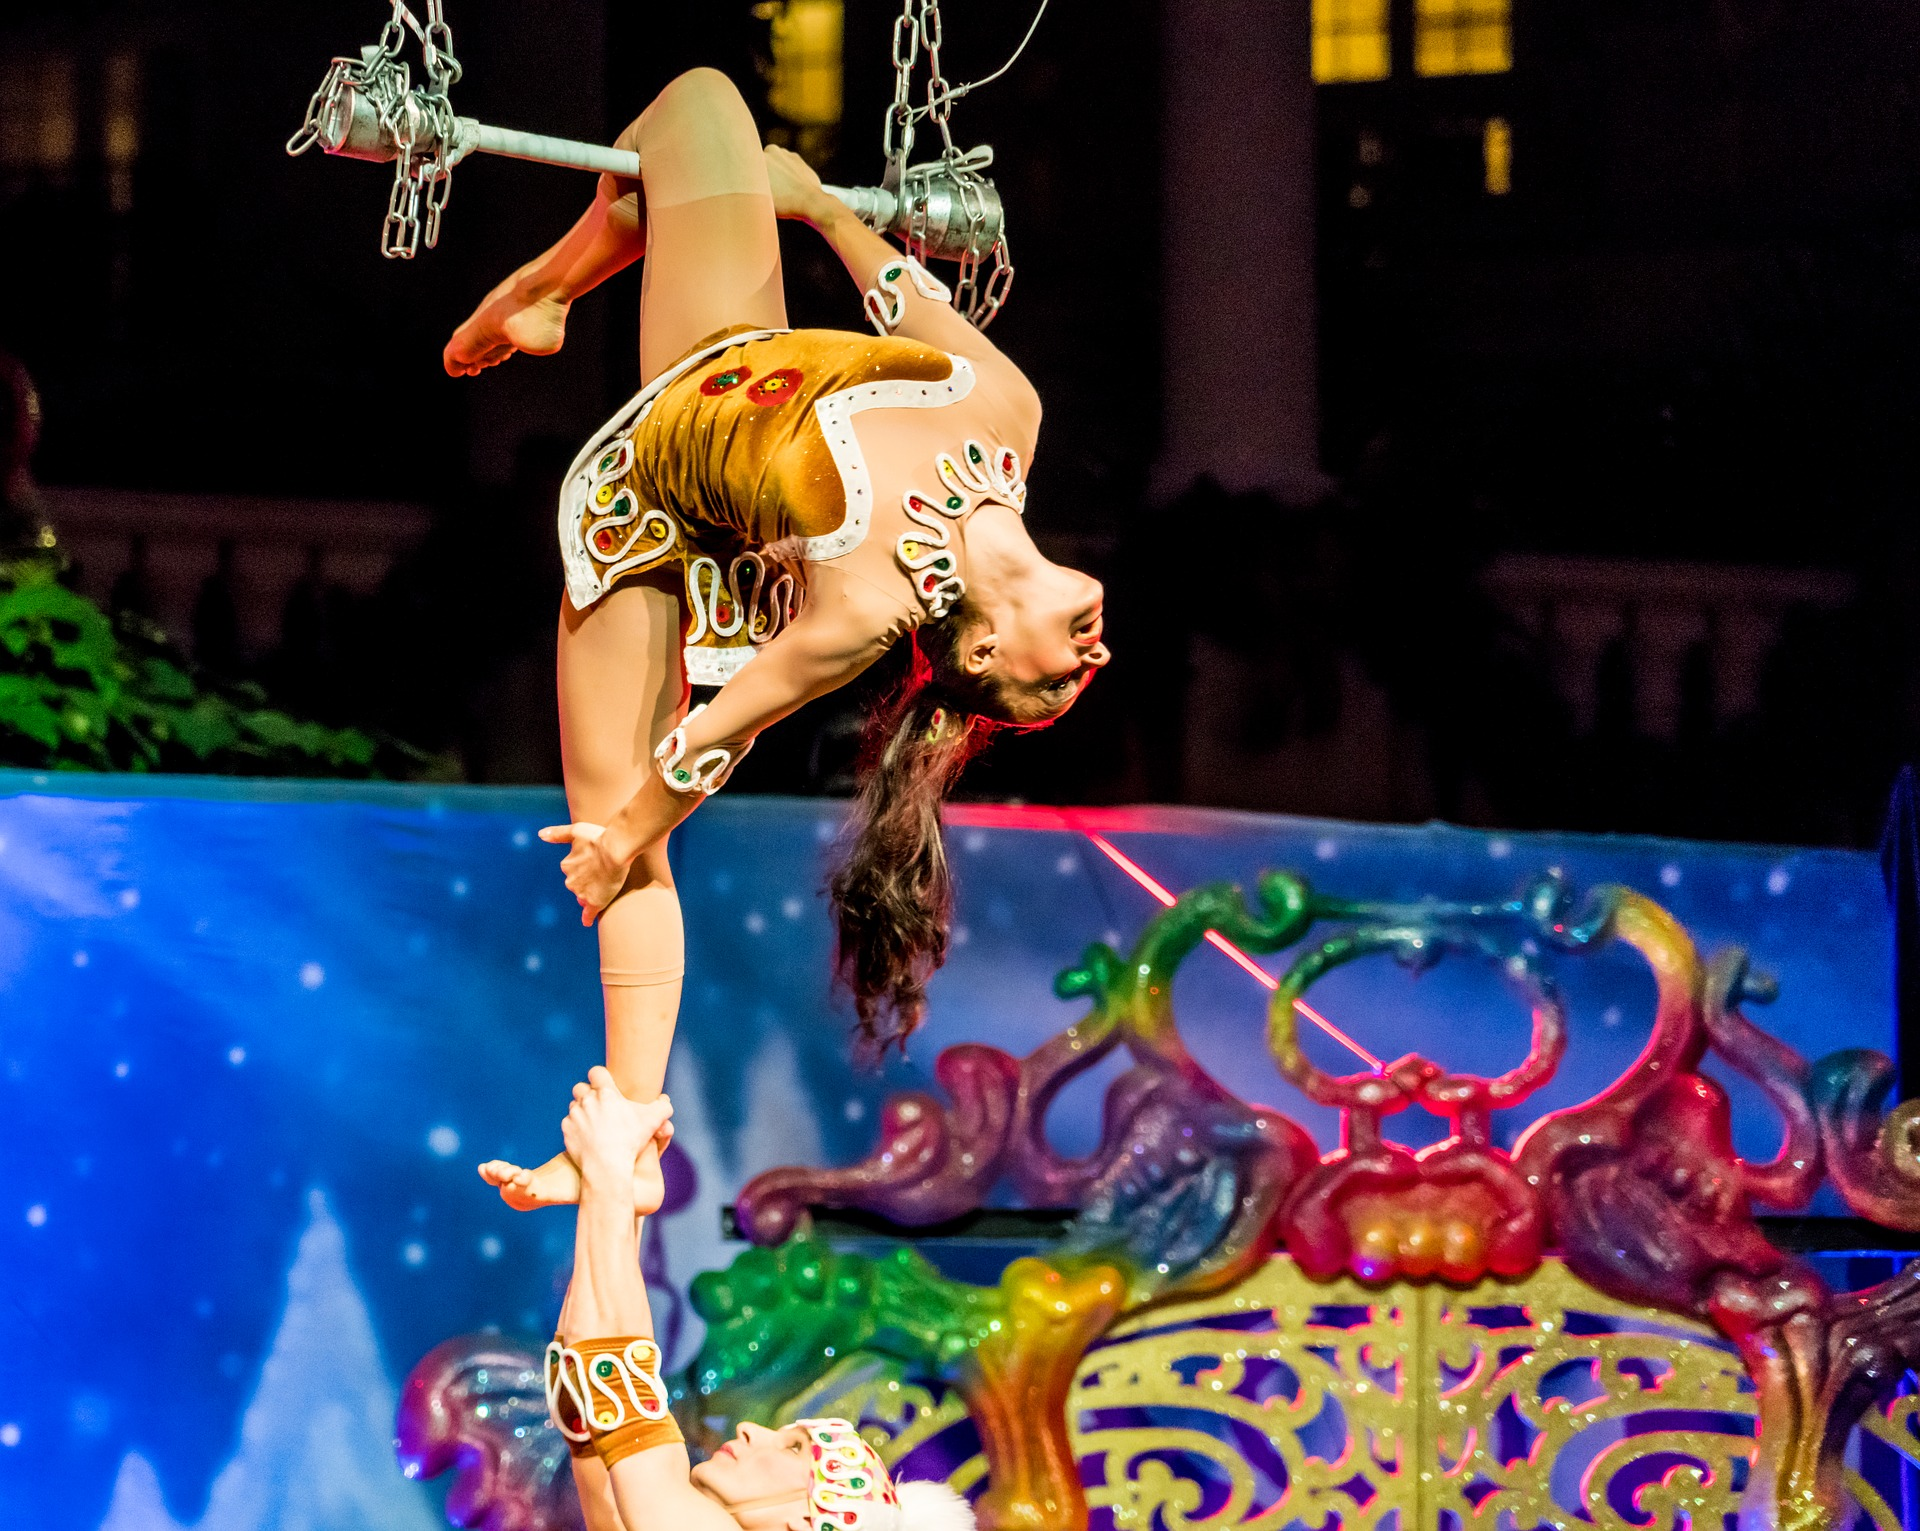 acrobats-1934621_1920.jpg